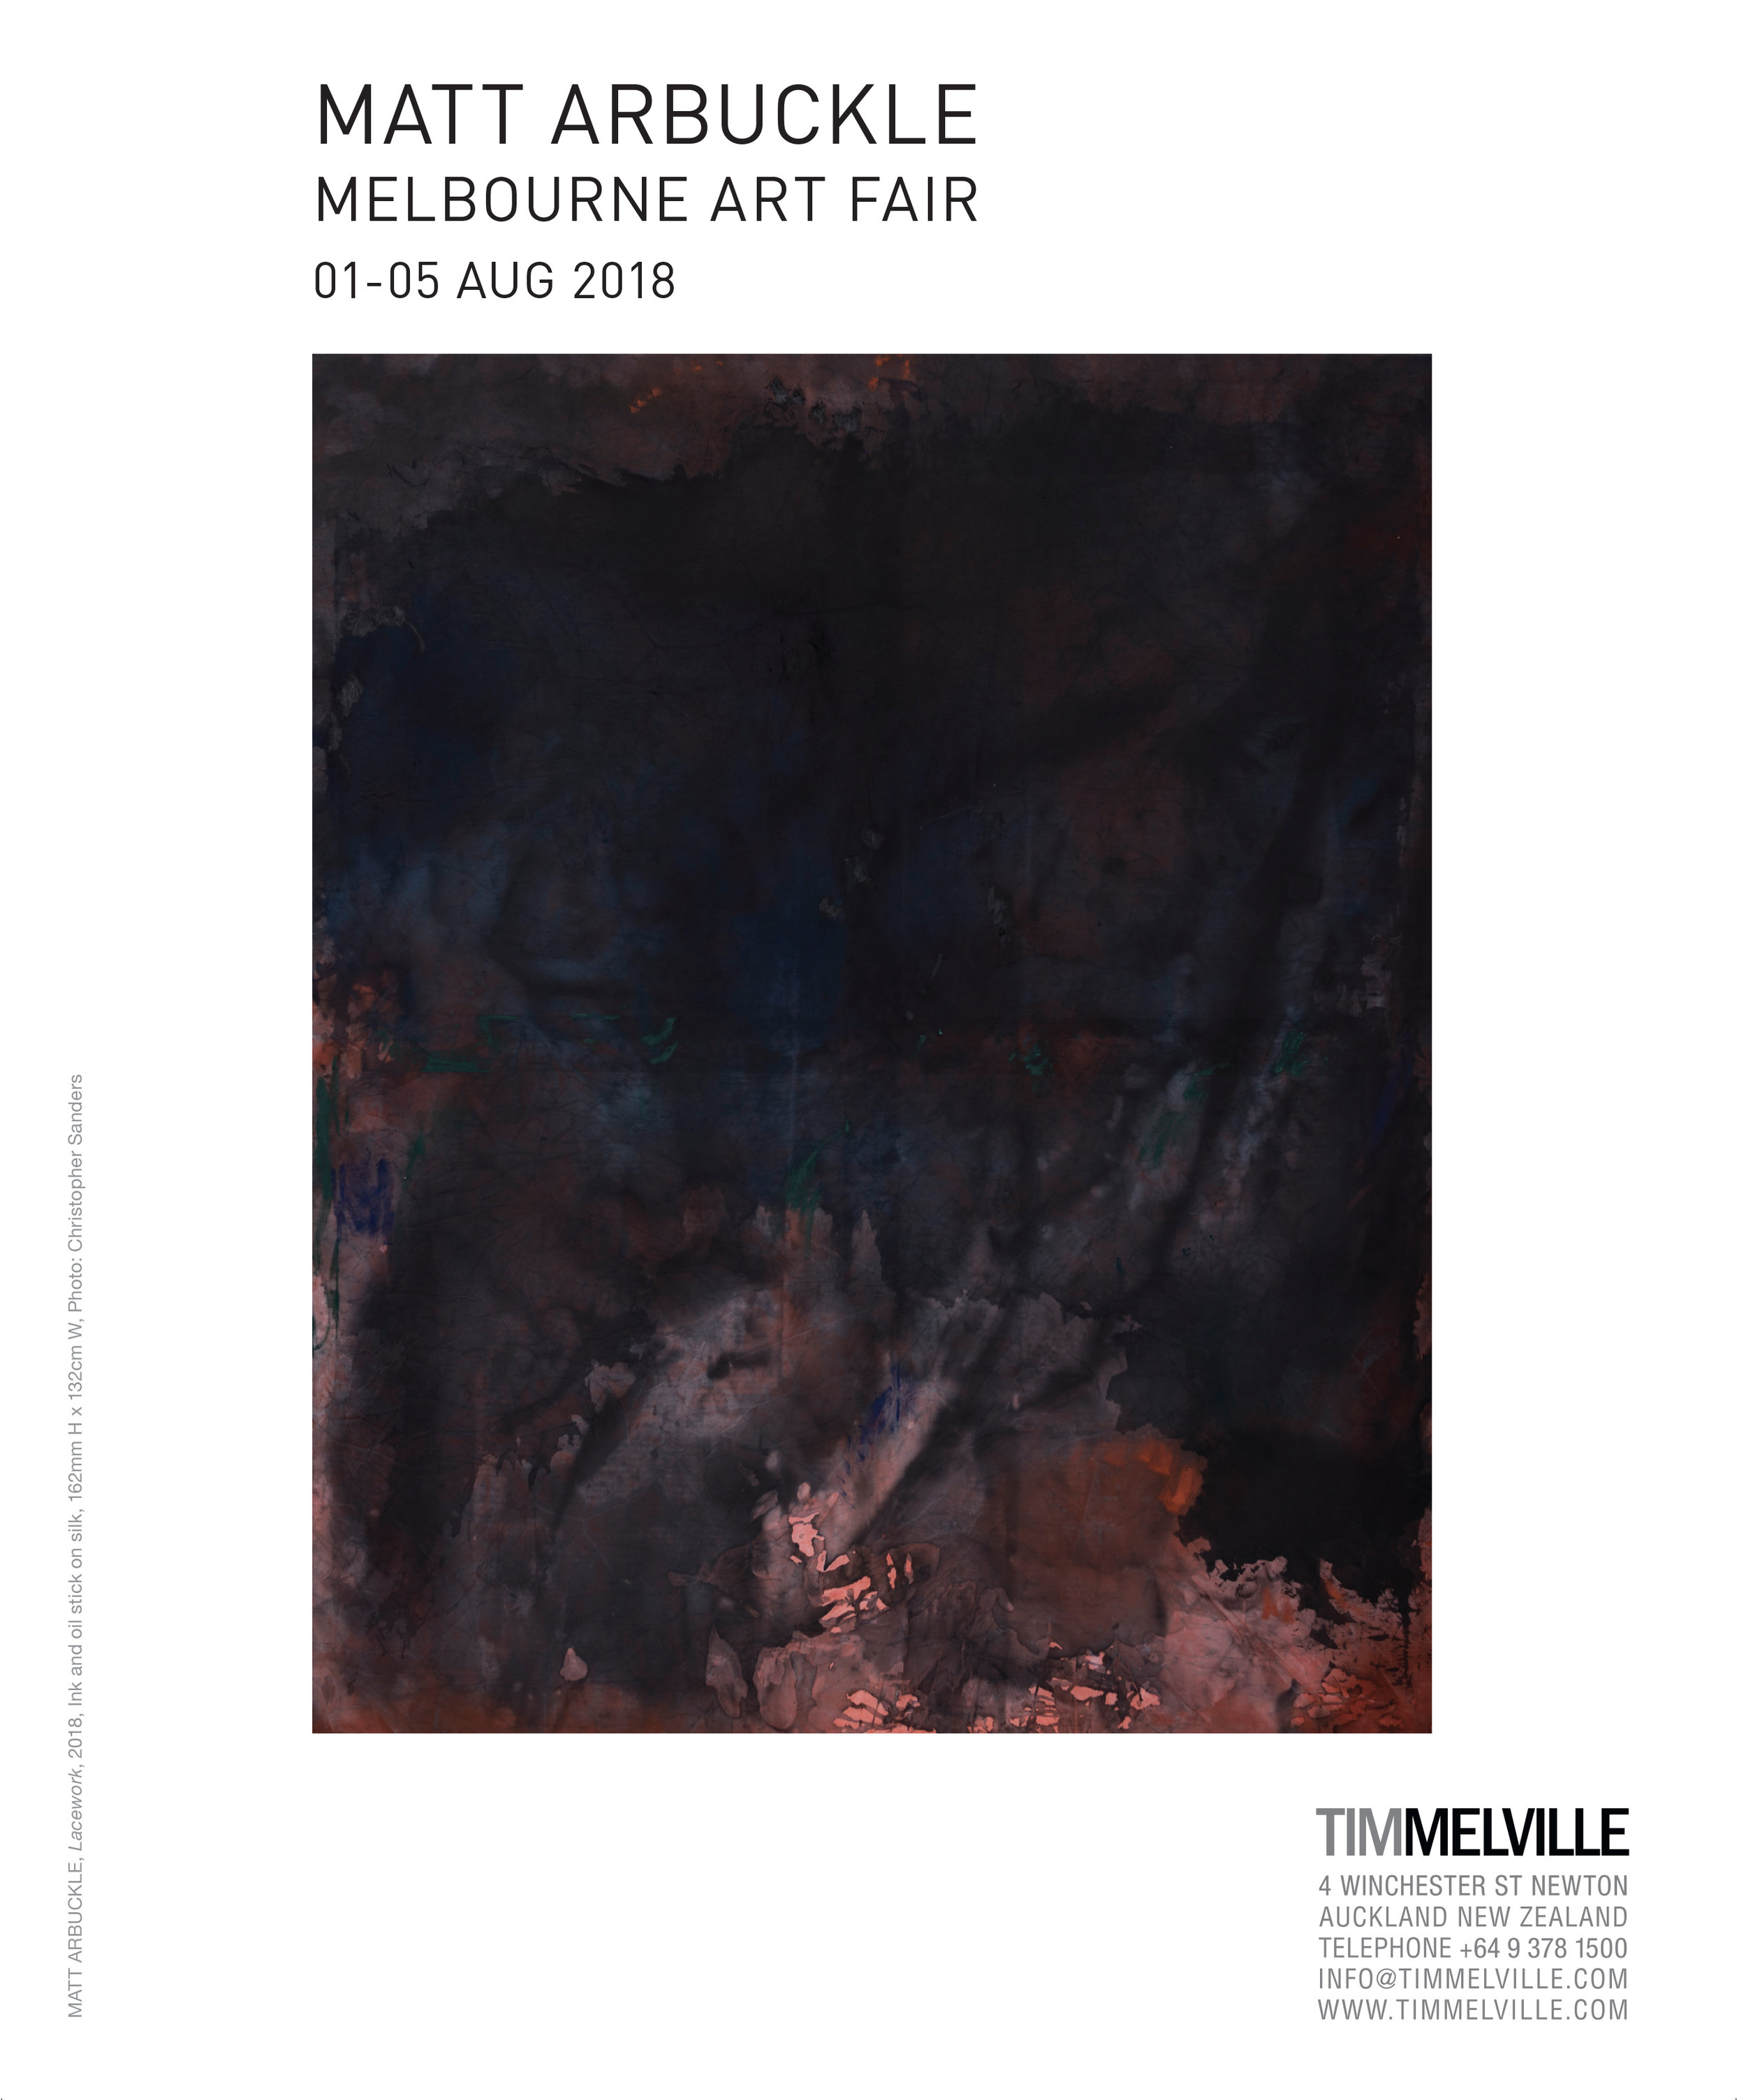 TMG Aus Art Col APR 2018.jpg